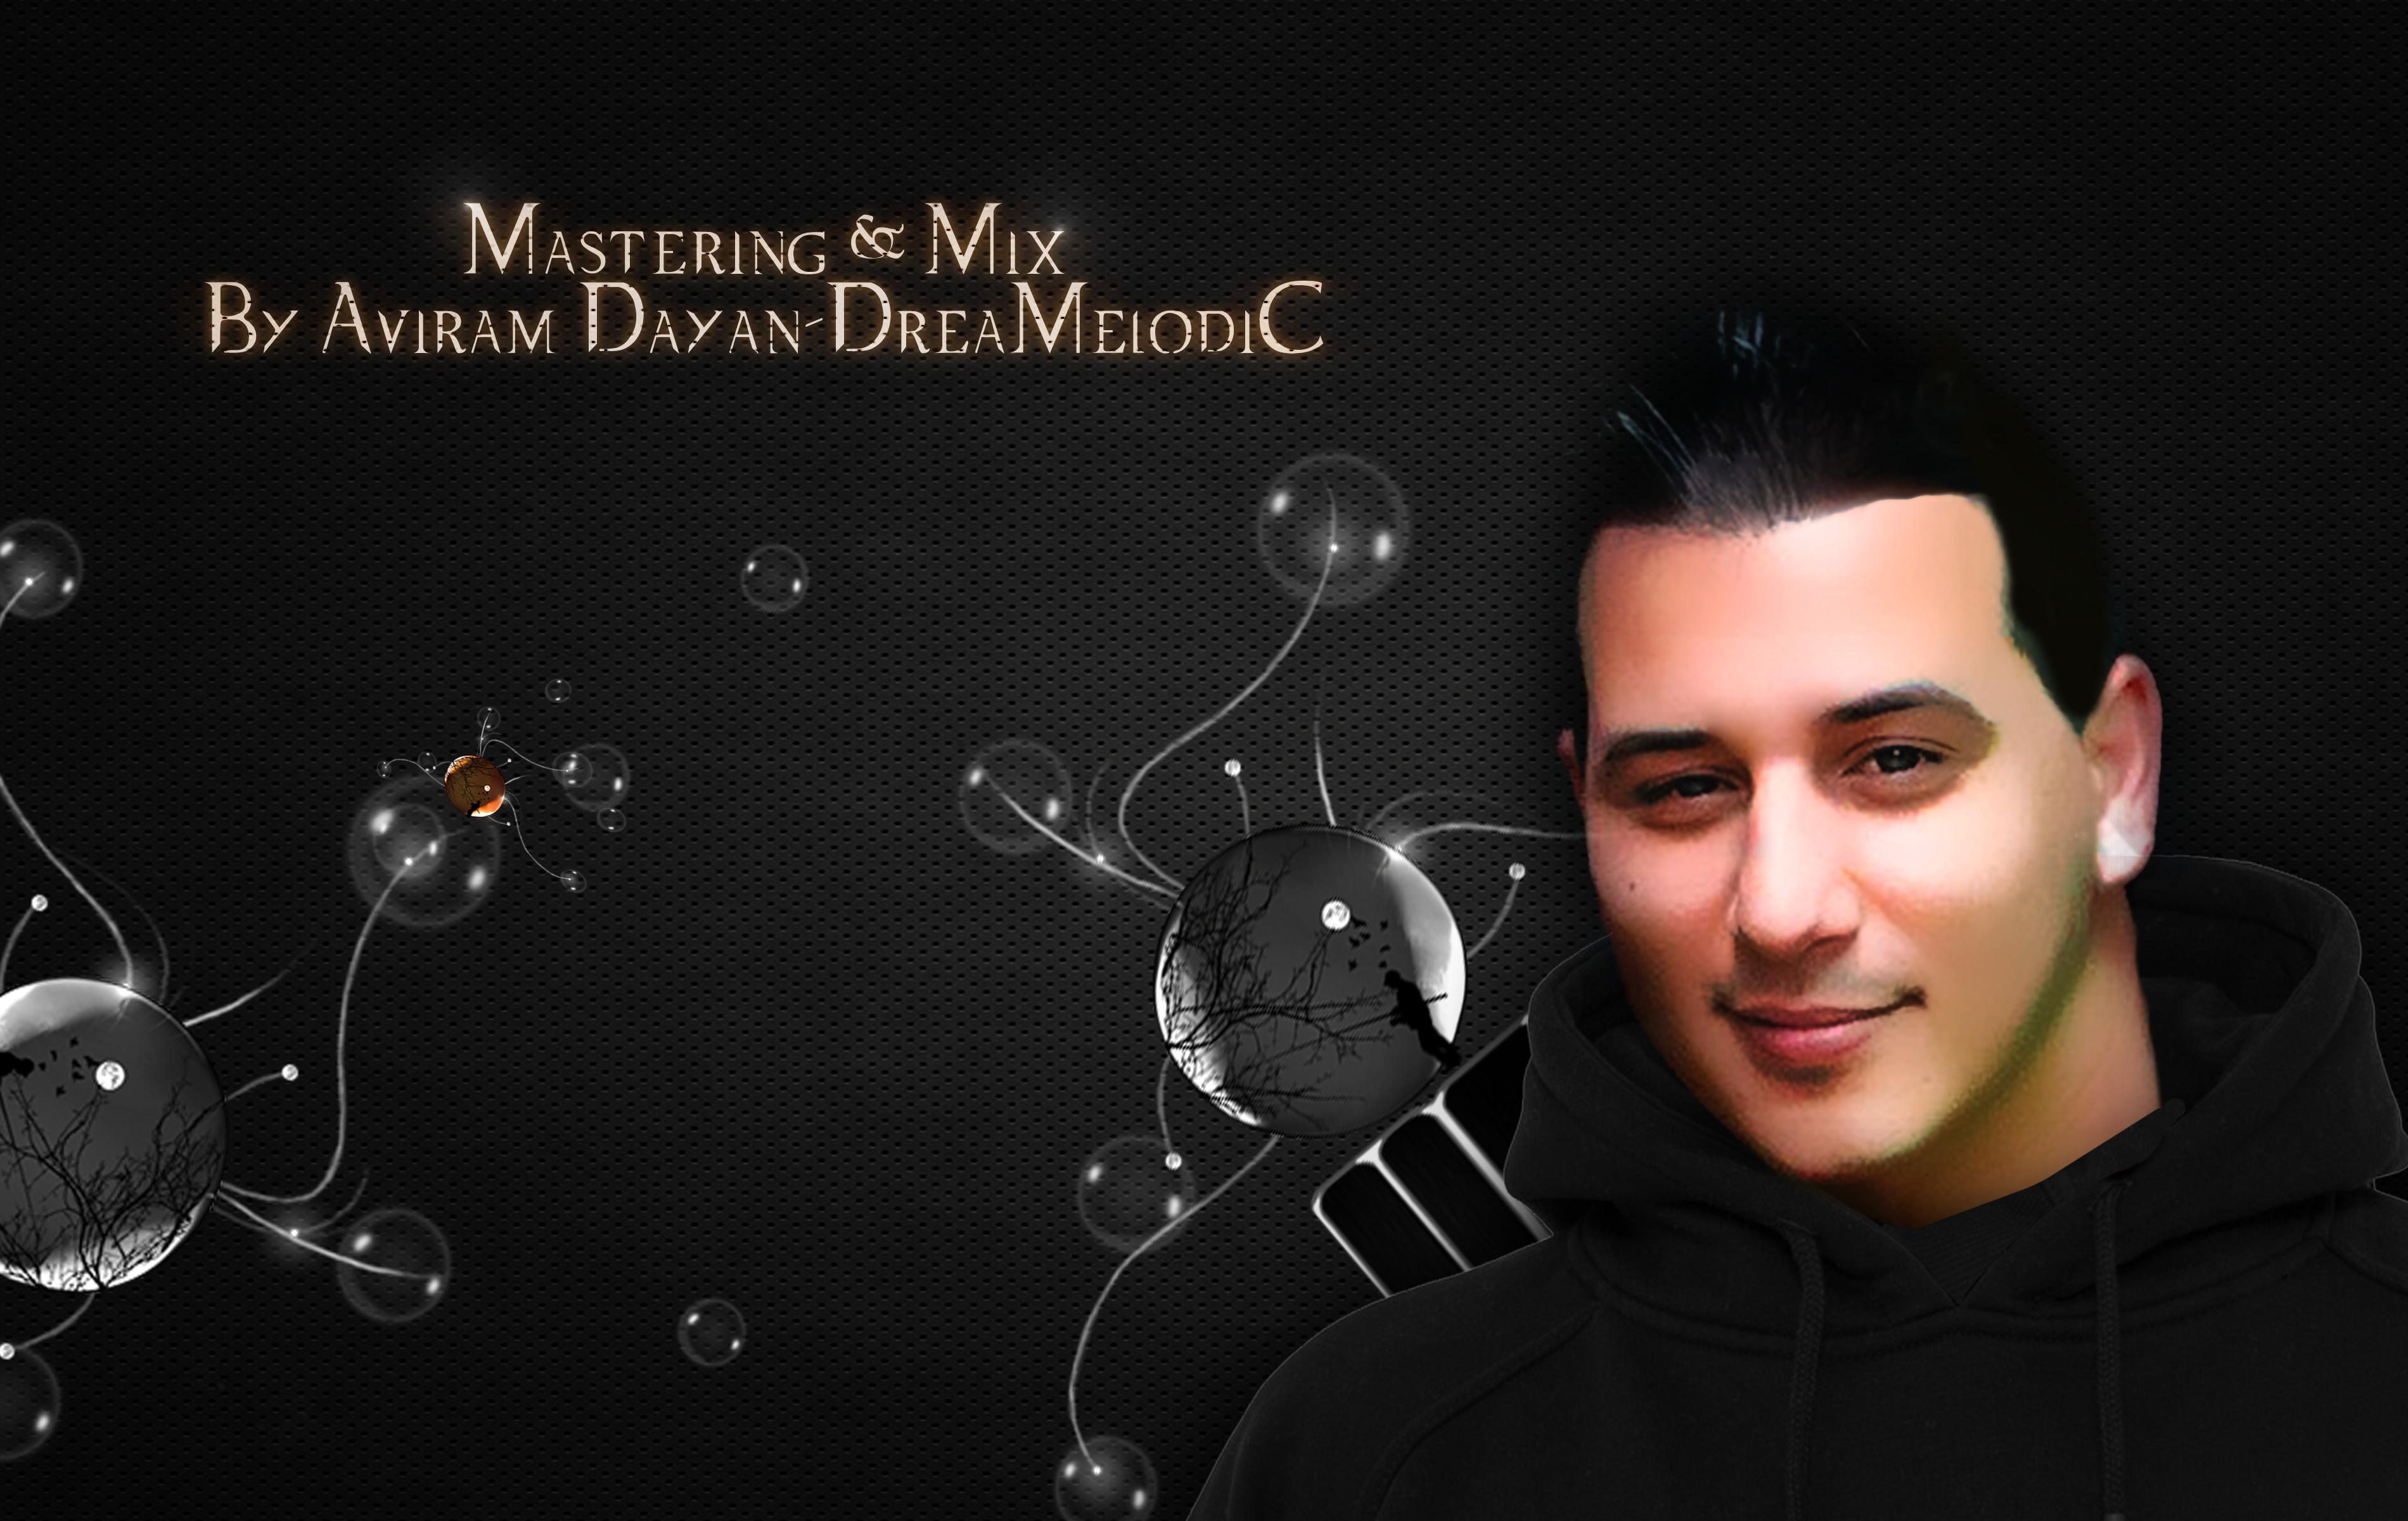 Mastering-&-Mix--By-Aviram-Dayan-DreaMelodiC-copy-4